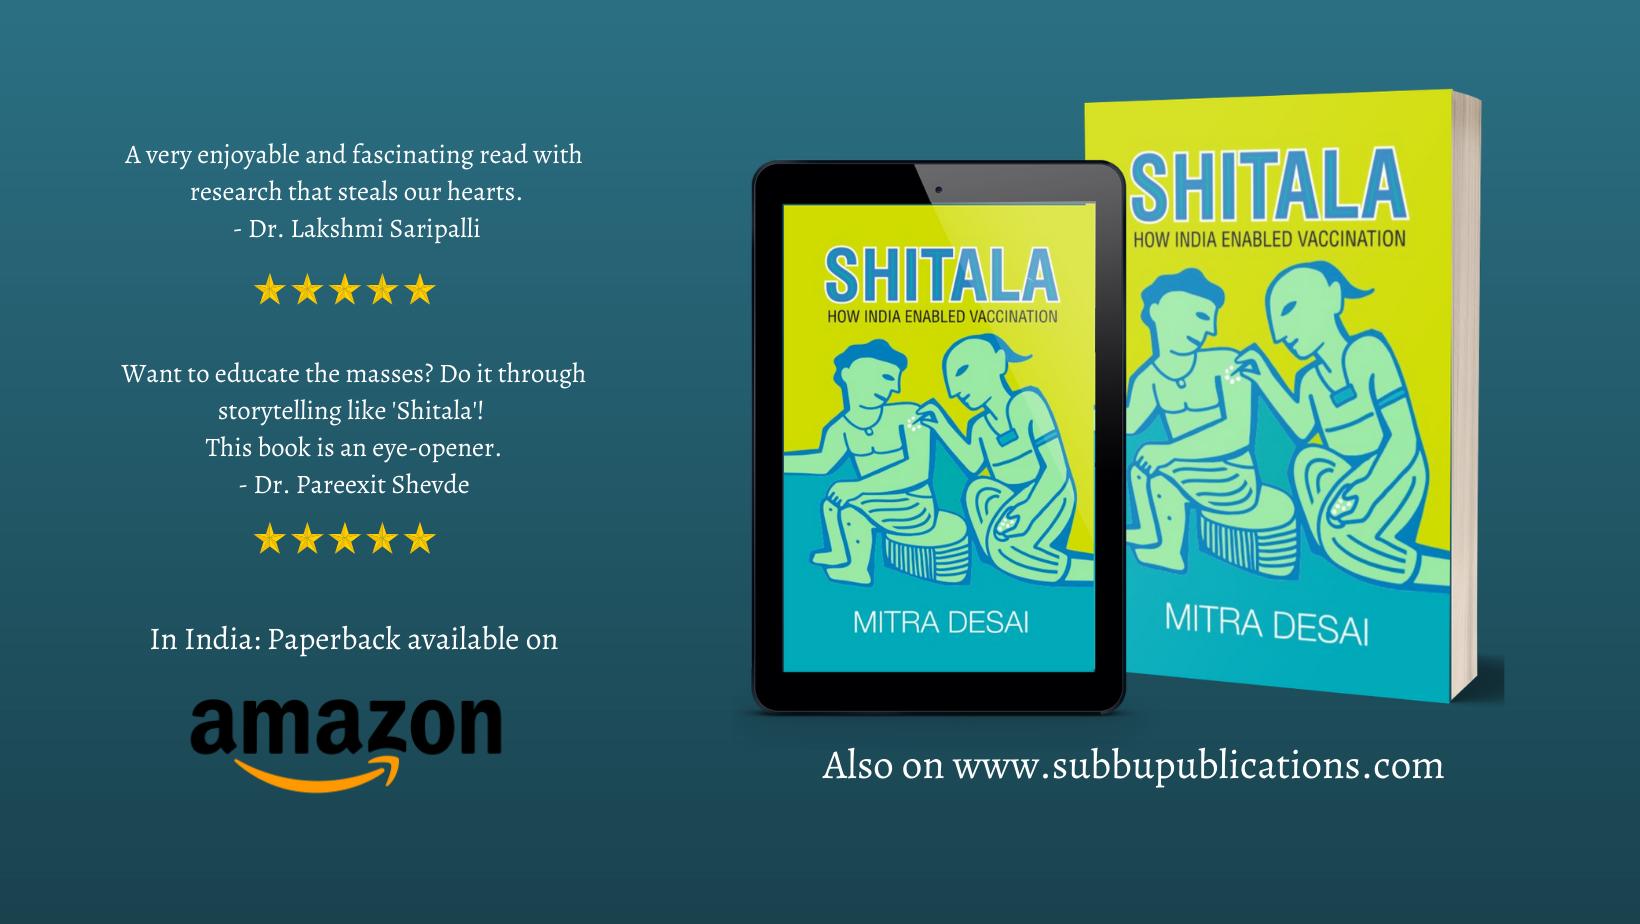 Shitala - Now on Amazon & Subbu Publications